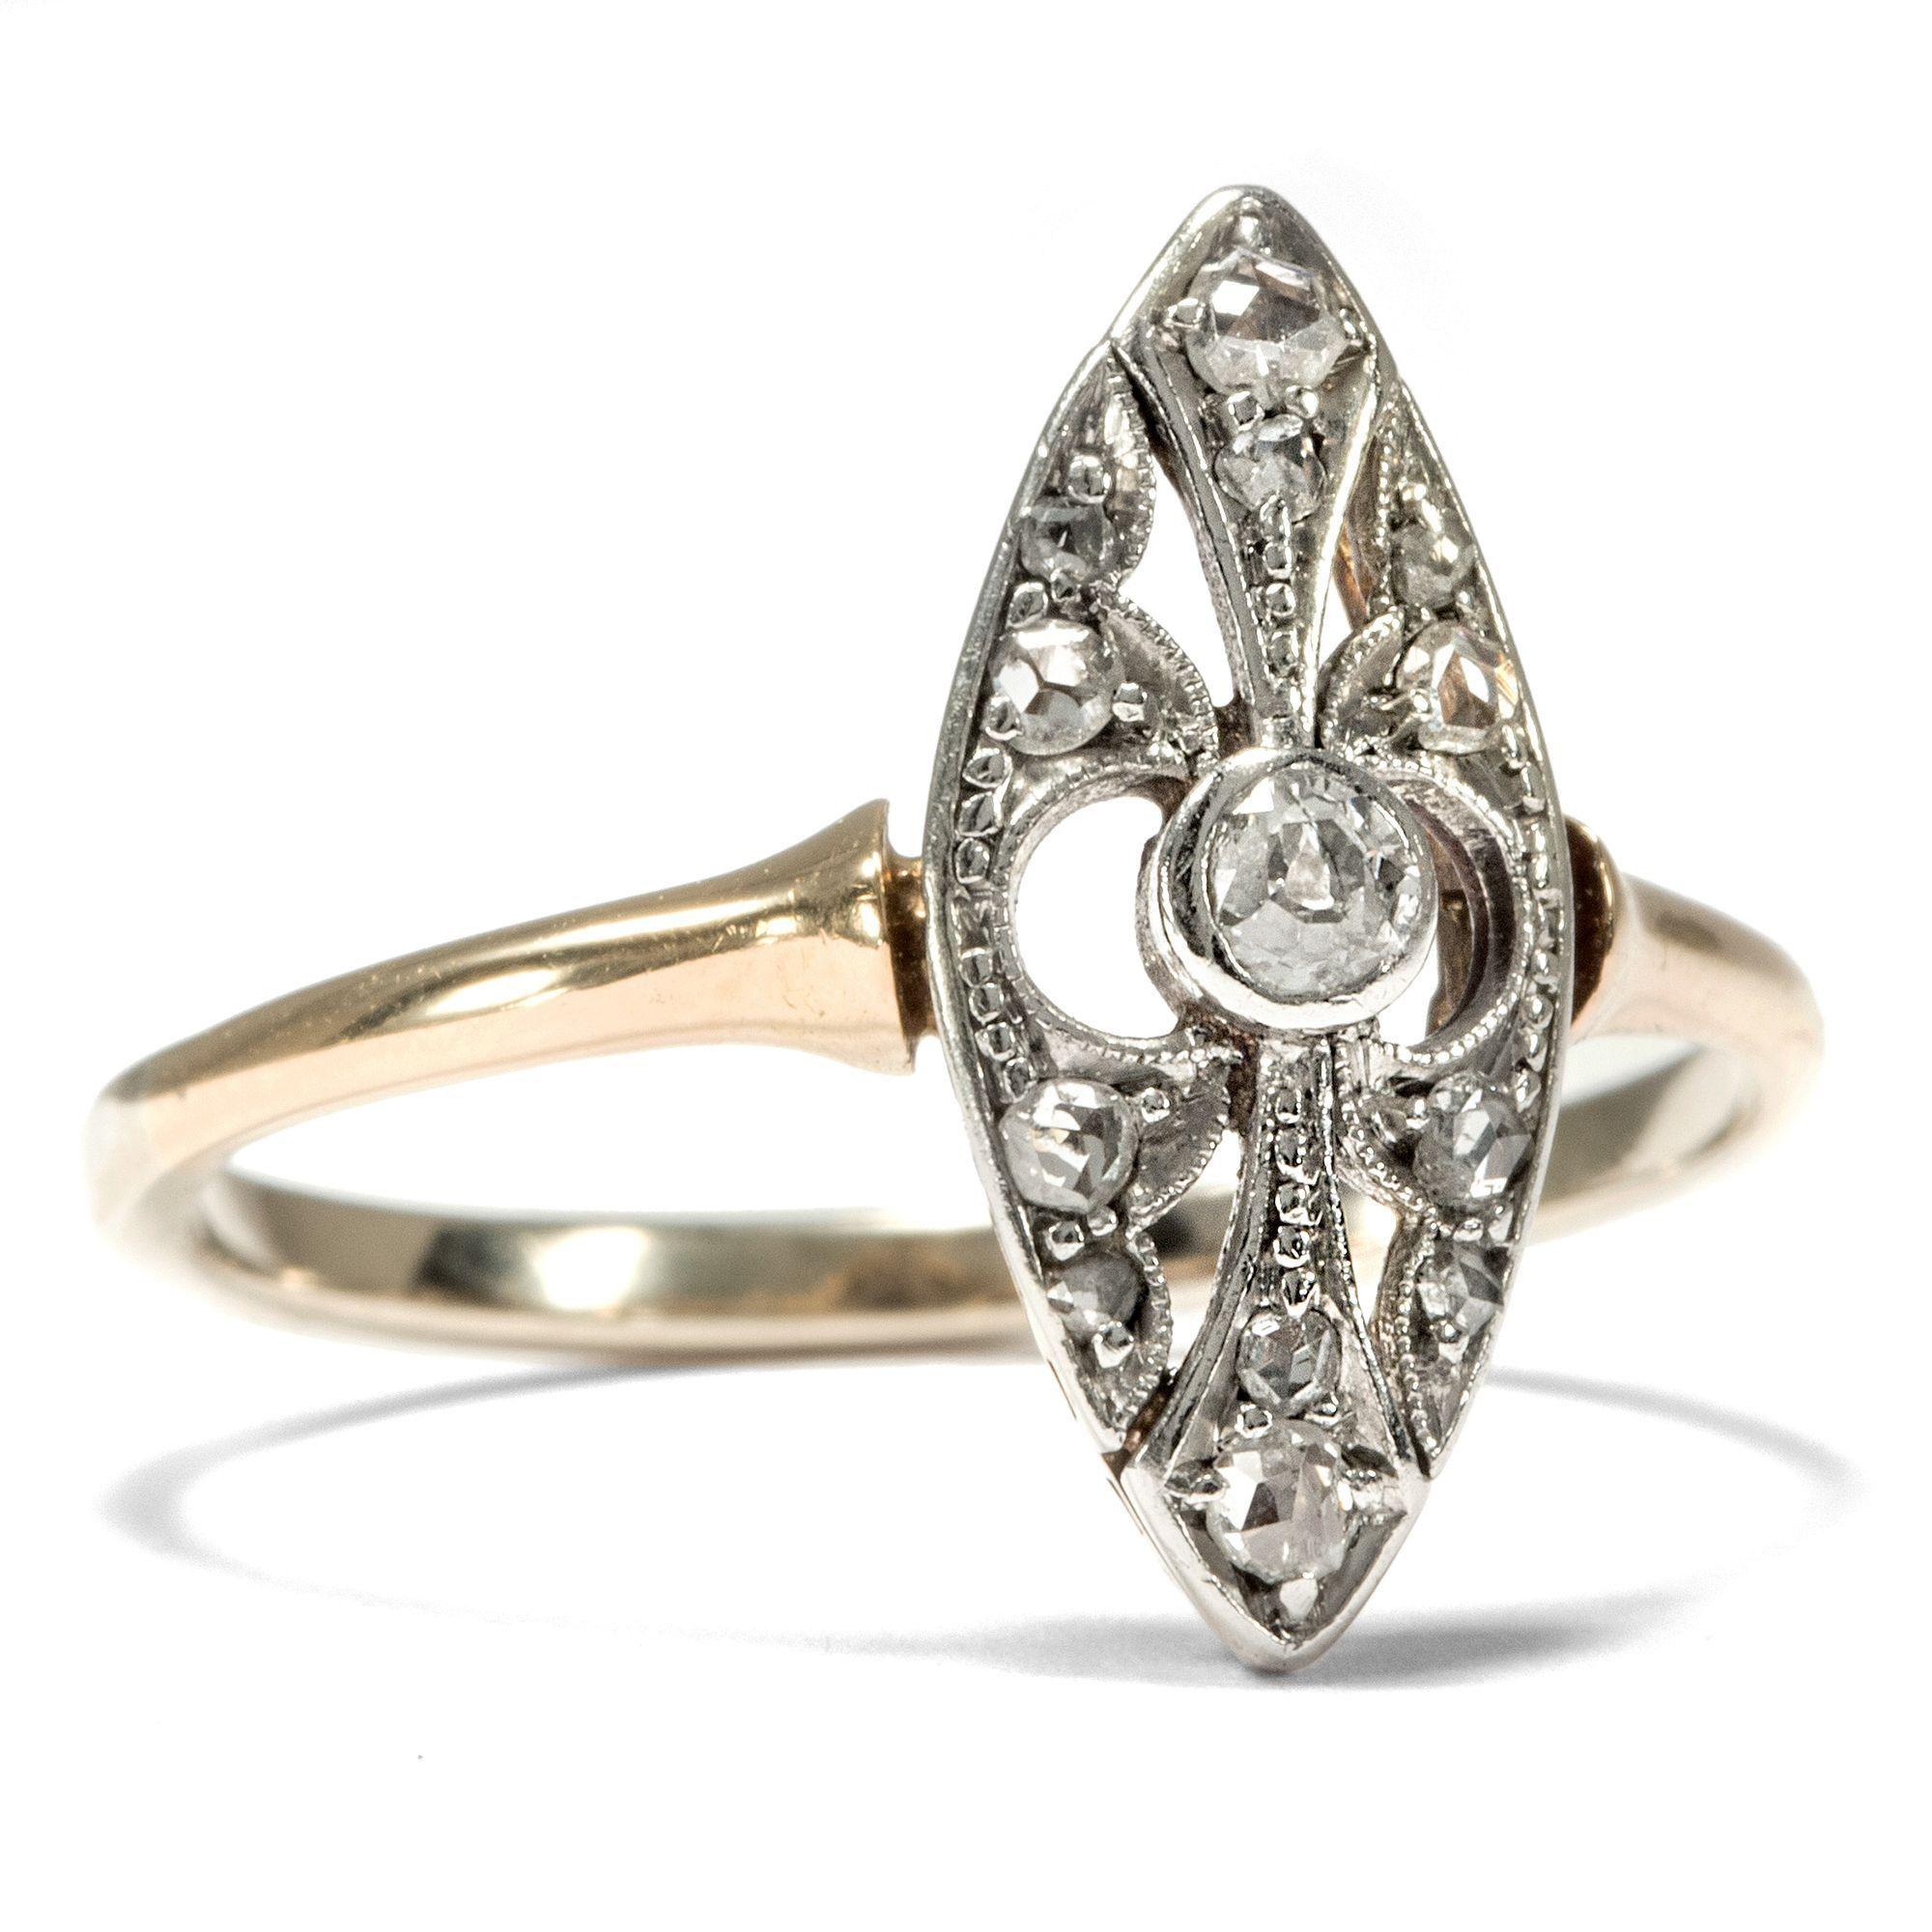 Antikschmuck ring gold